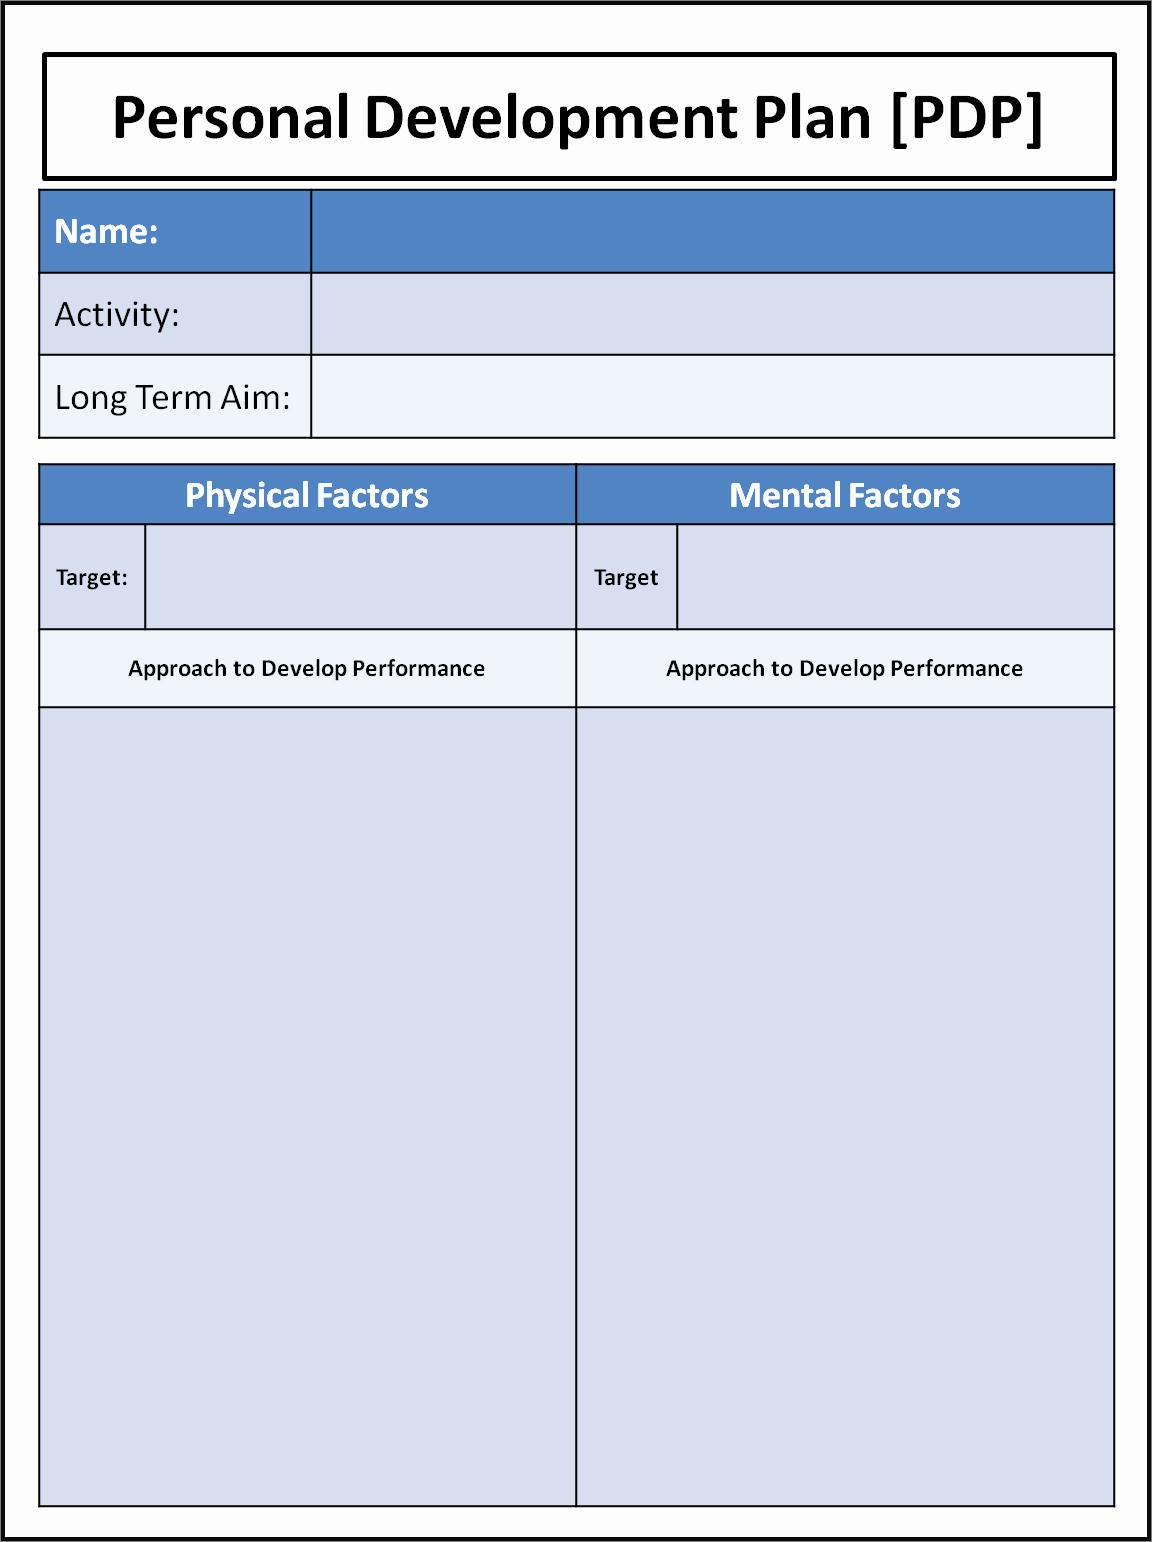 Personal Development Plan Sample Beautiful Personal Development Plan – Higher Pe